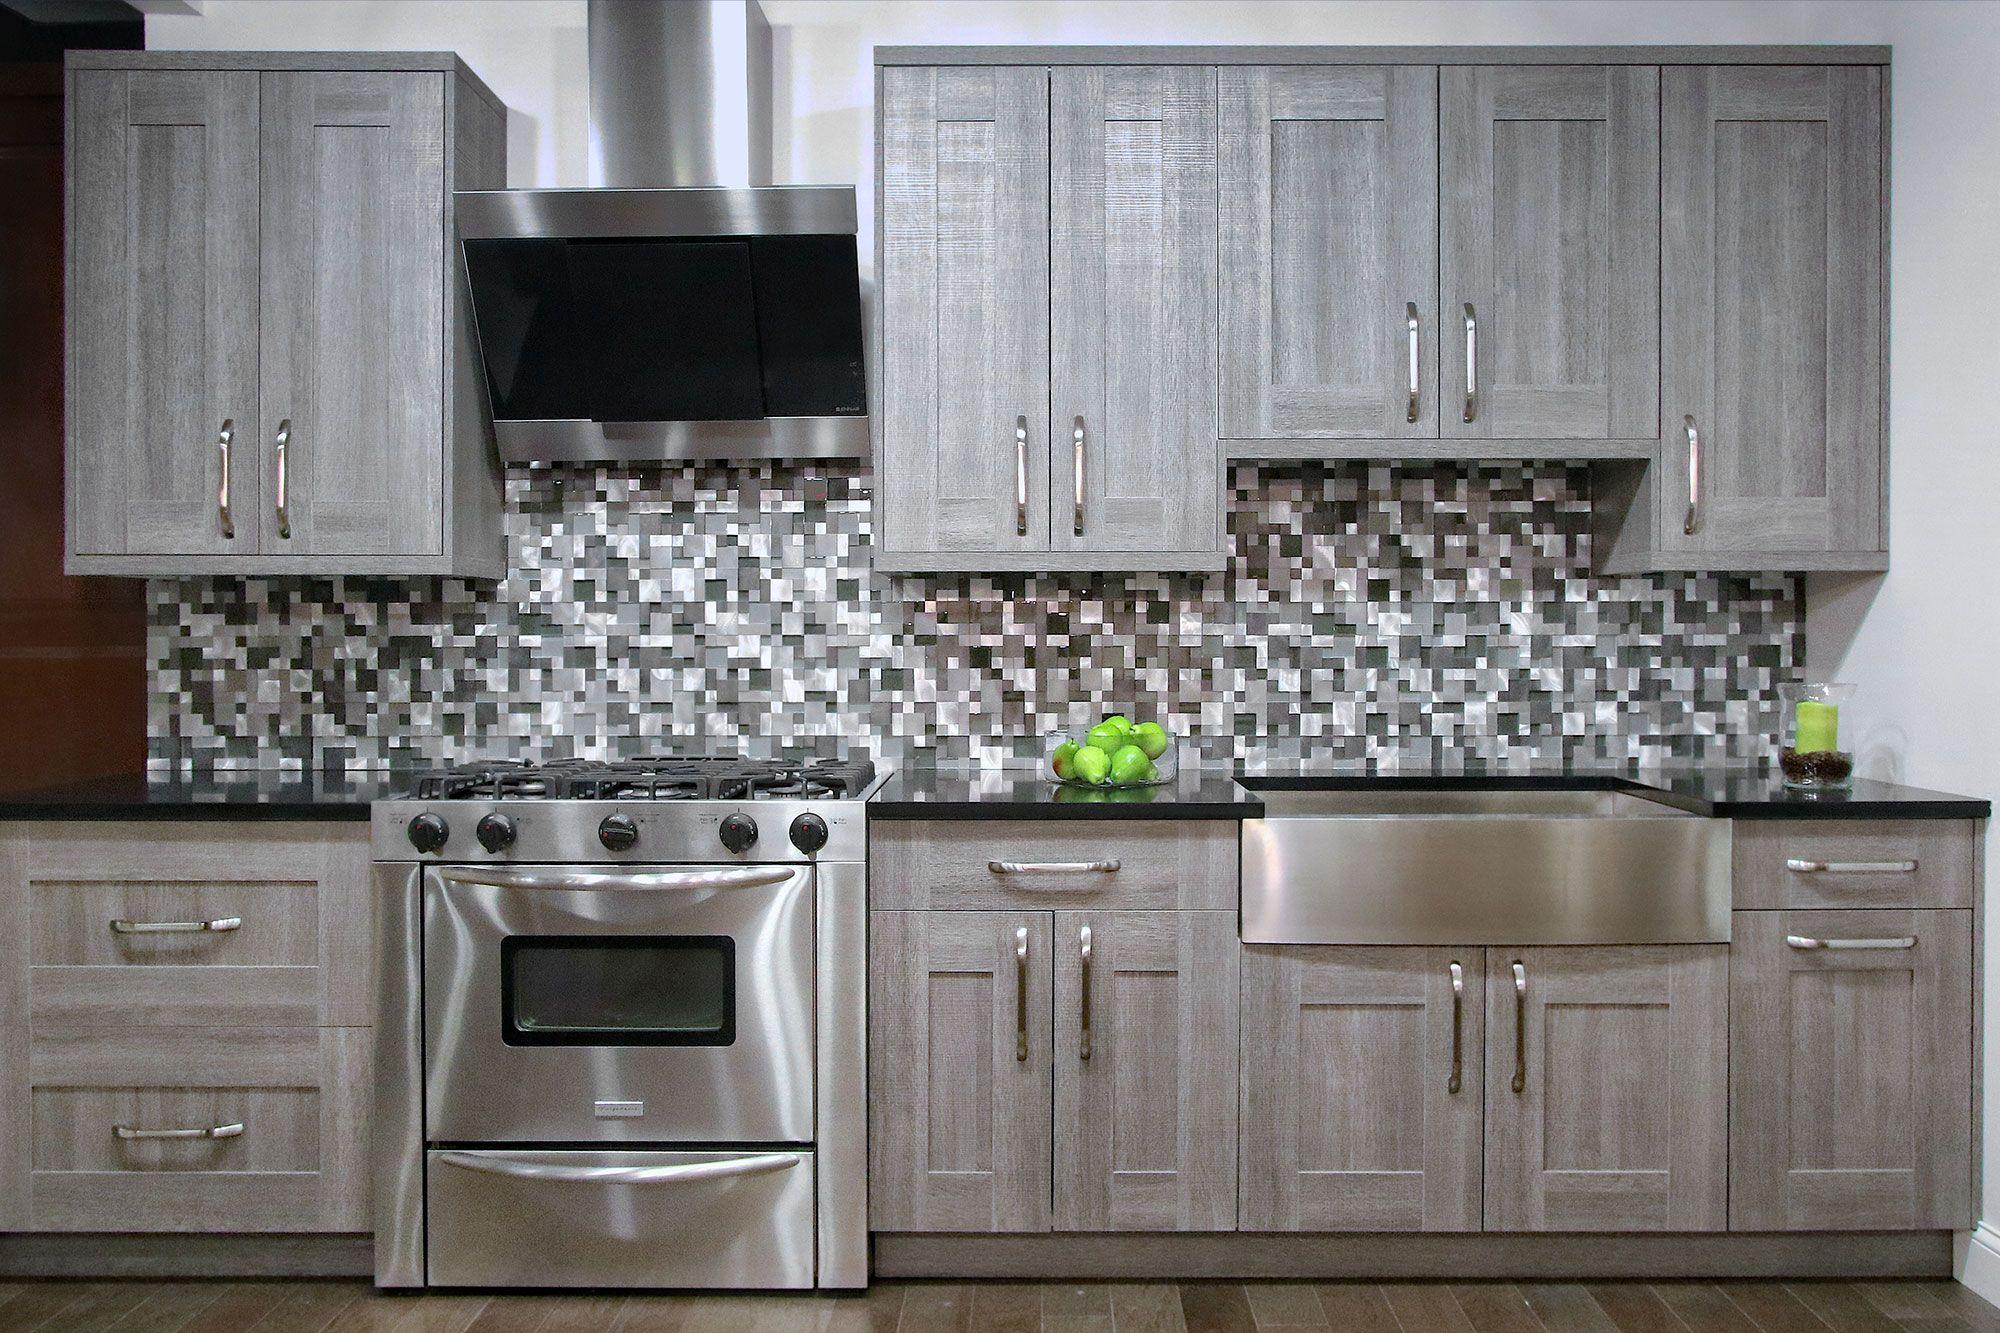 melamine kitchen cabinets area rug and bathroom vanity